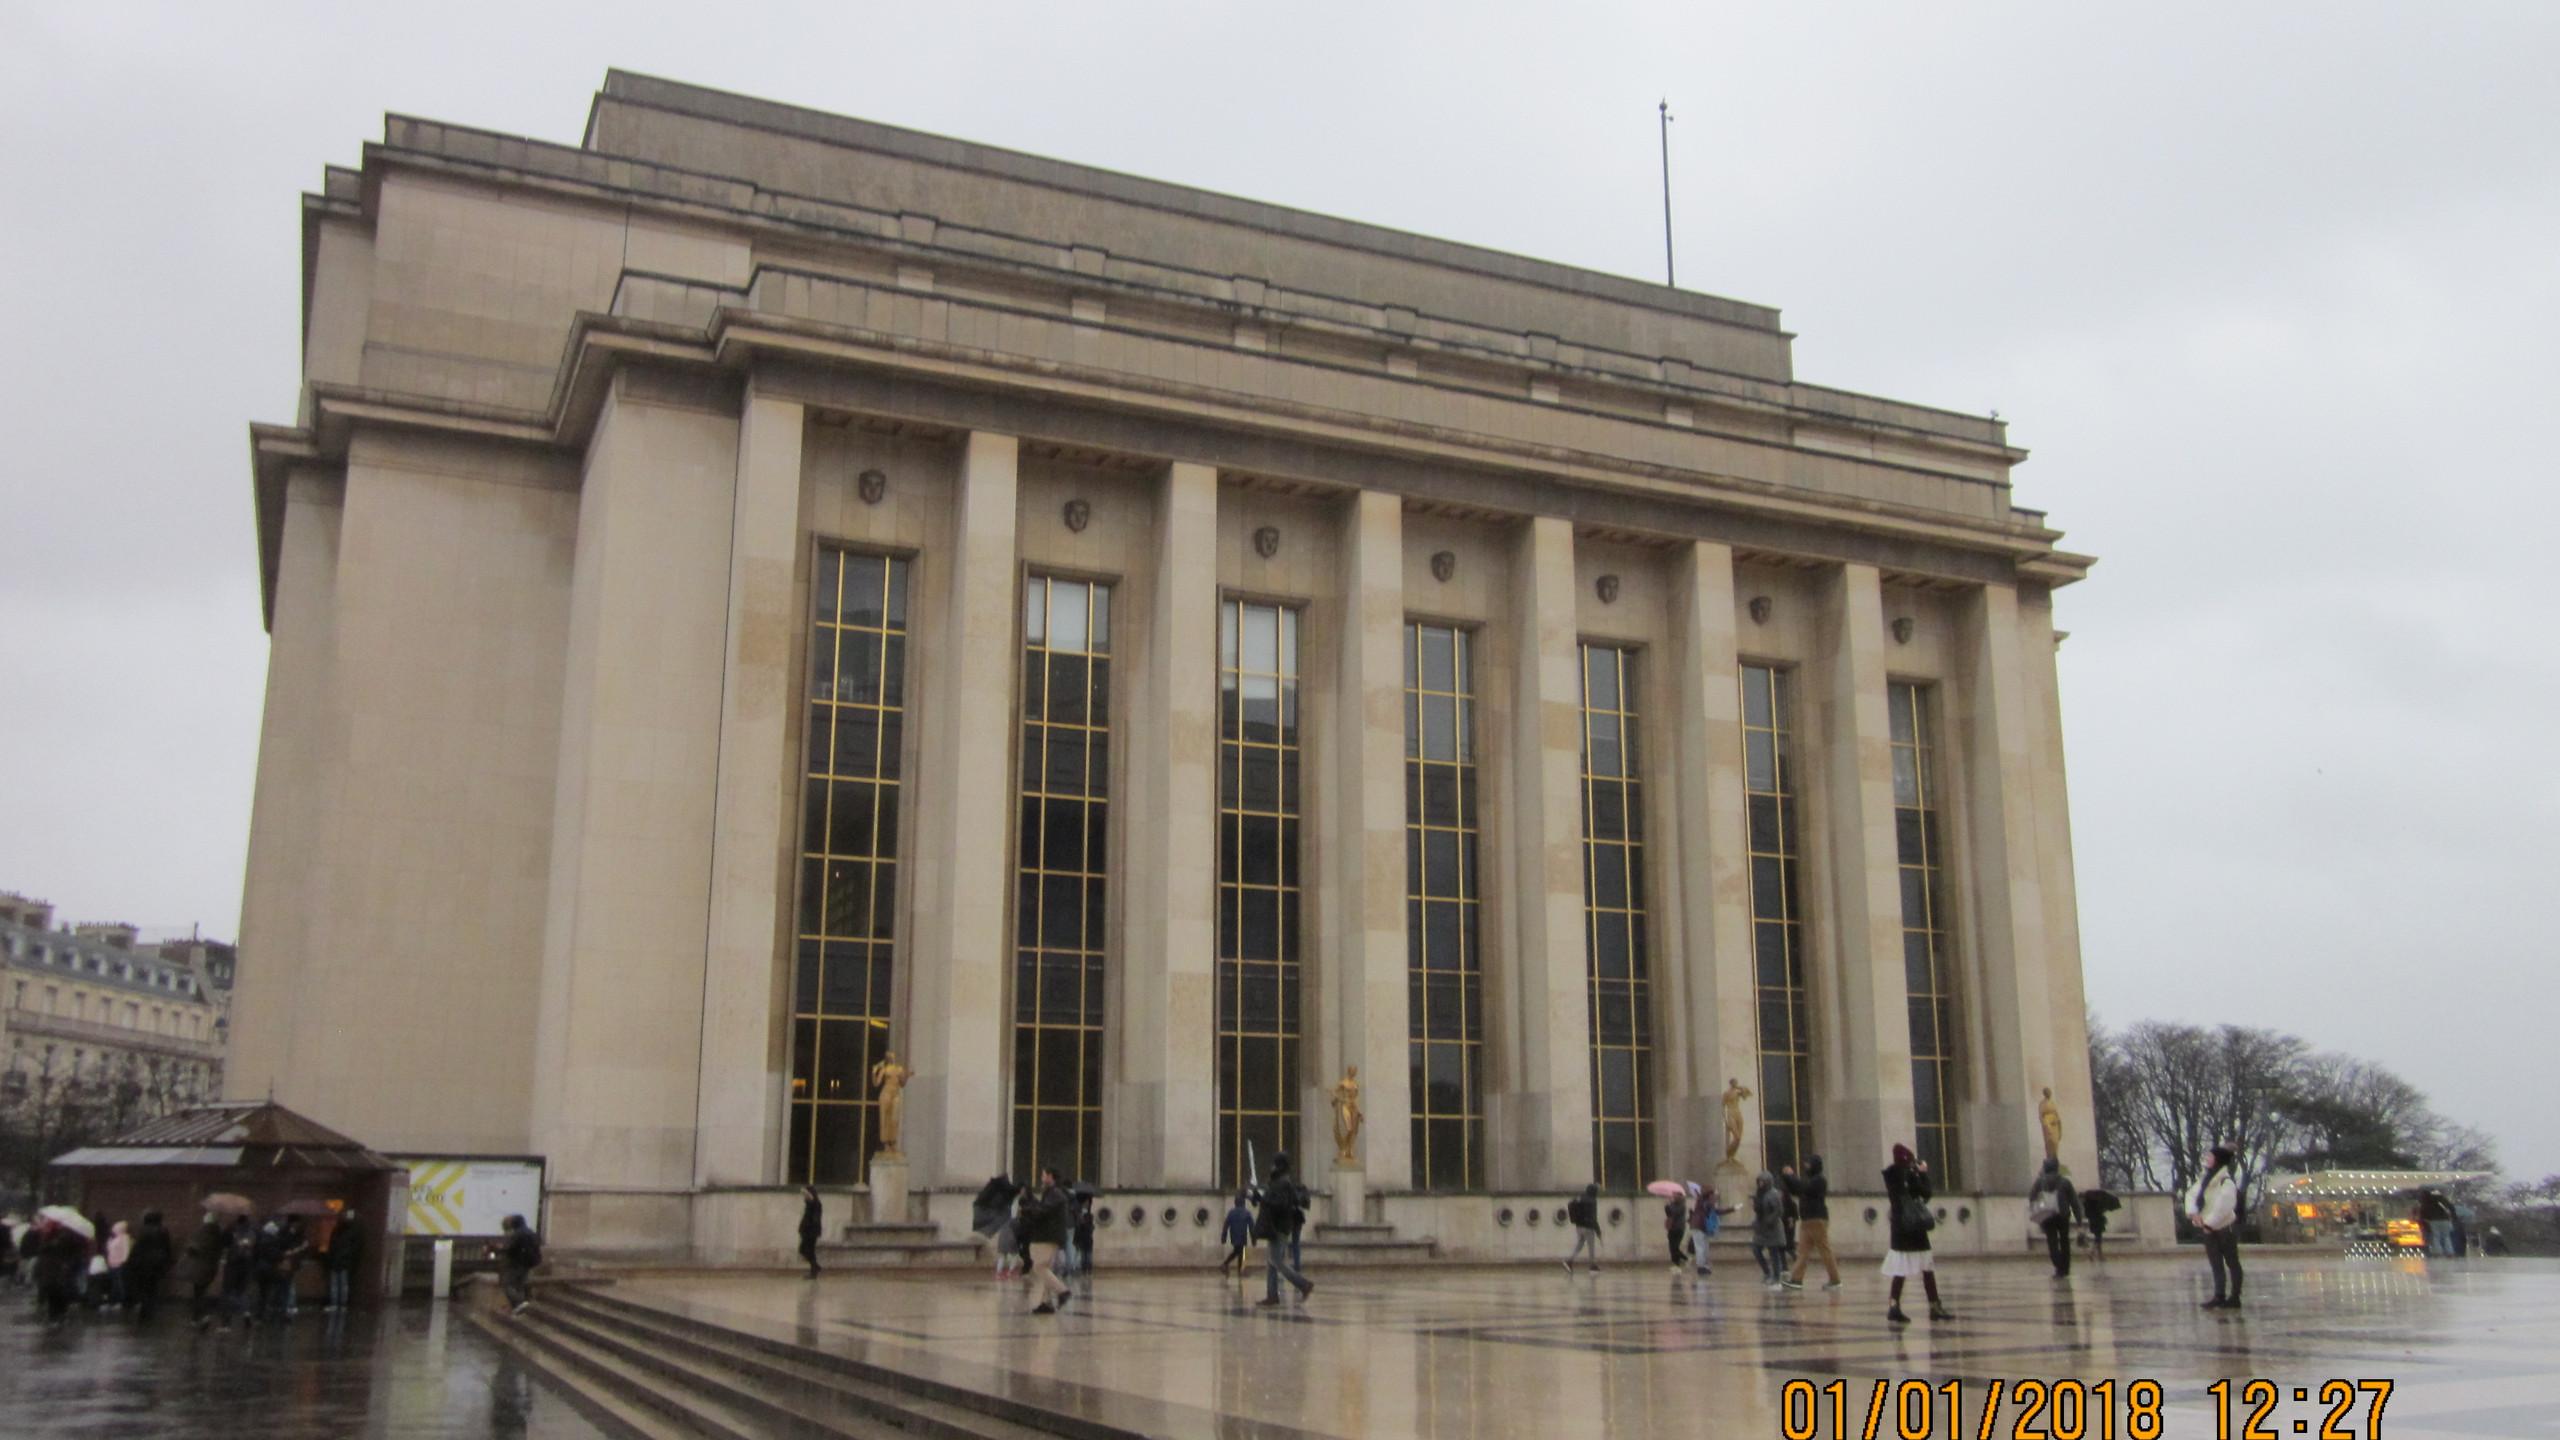 Le Palais de Chaillot - 1937